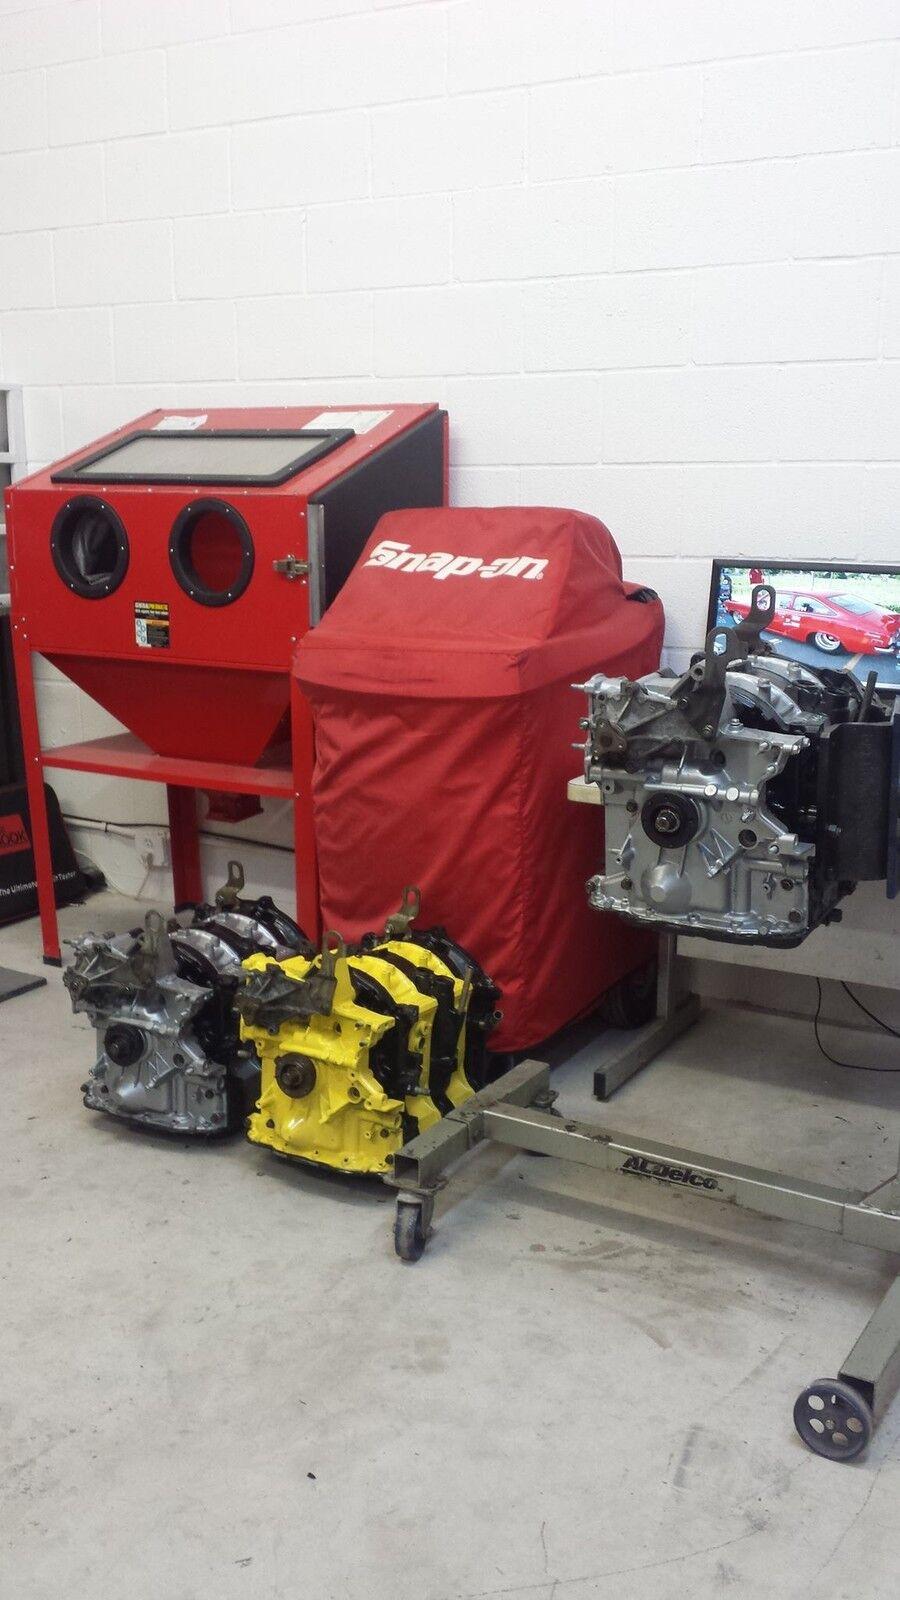 OJ IMPORTS ROTARY ENGINES